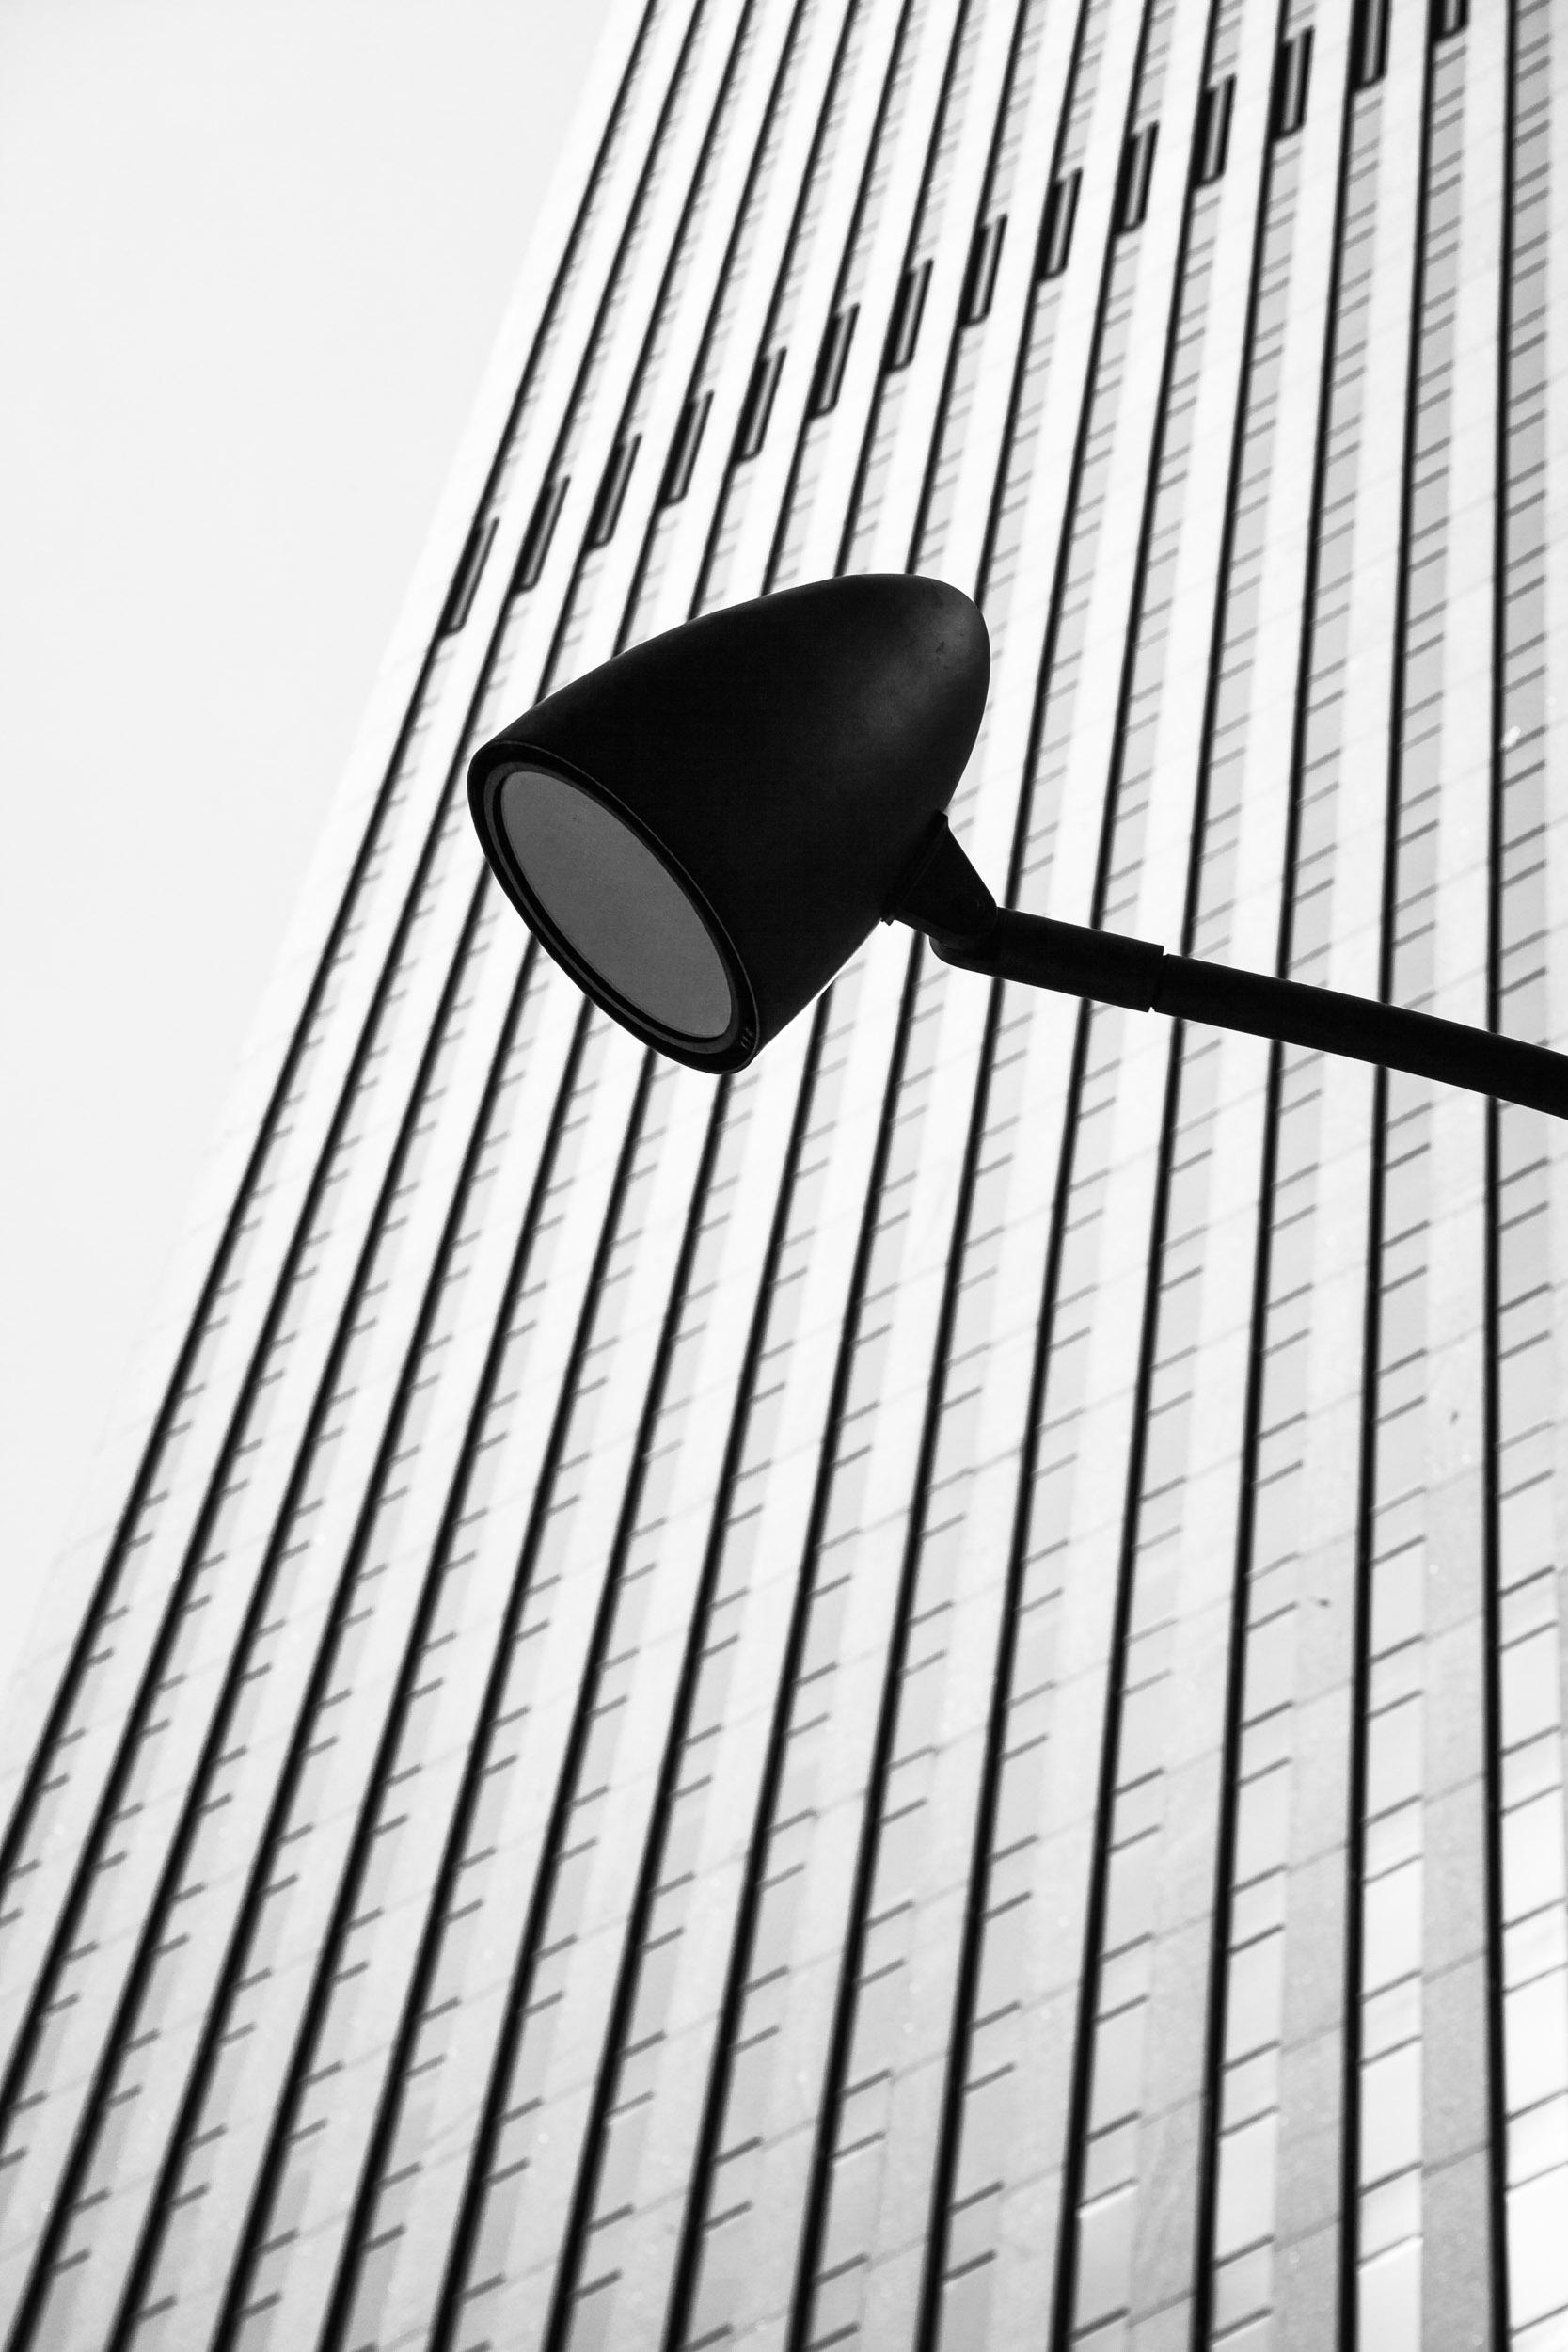 Streetlights of New York #14 New York, NY 2010